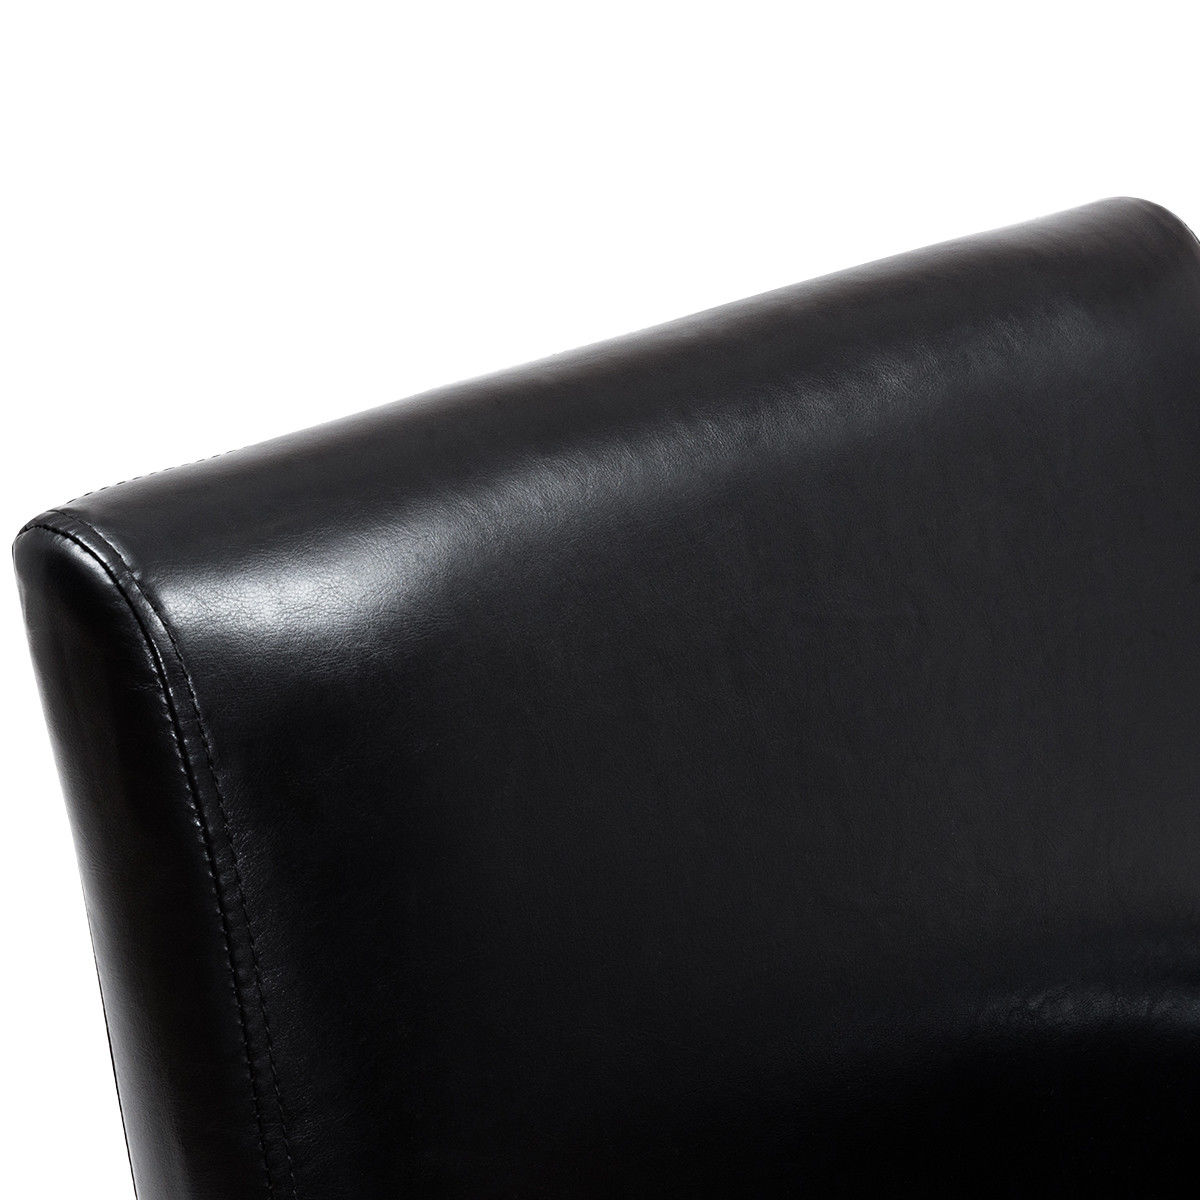 Modern PU Leather Executive Arm Chair Sofa